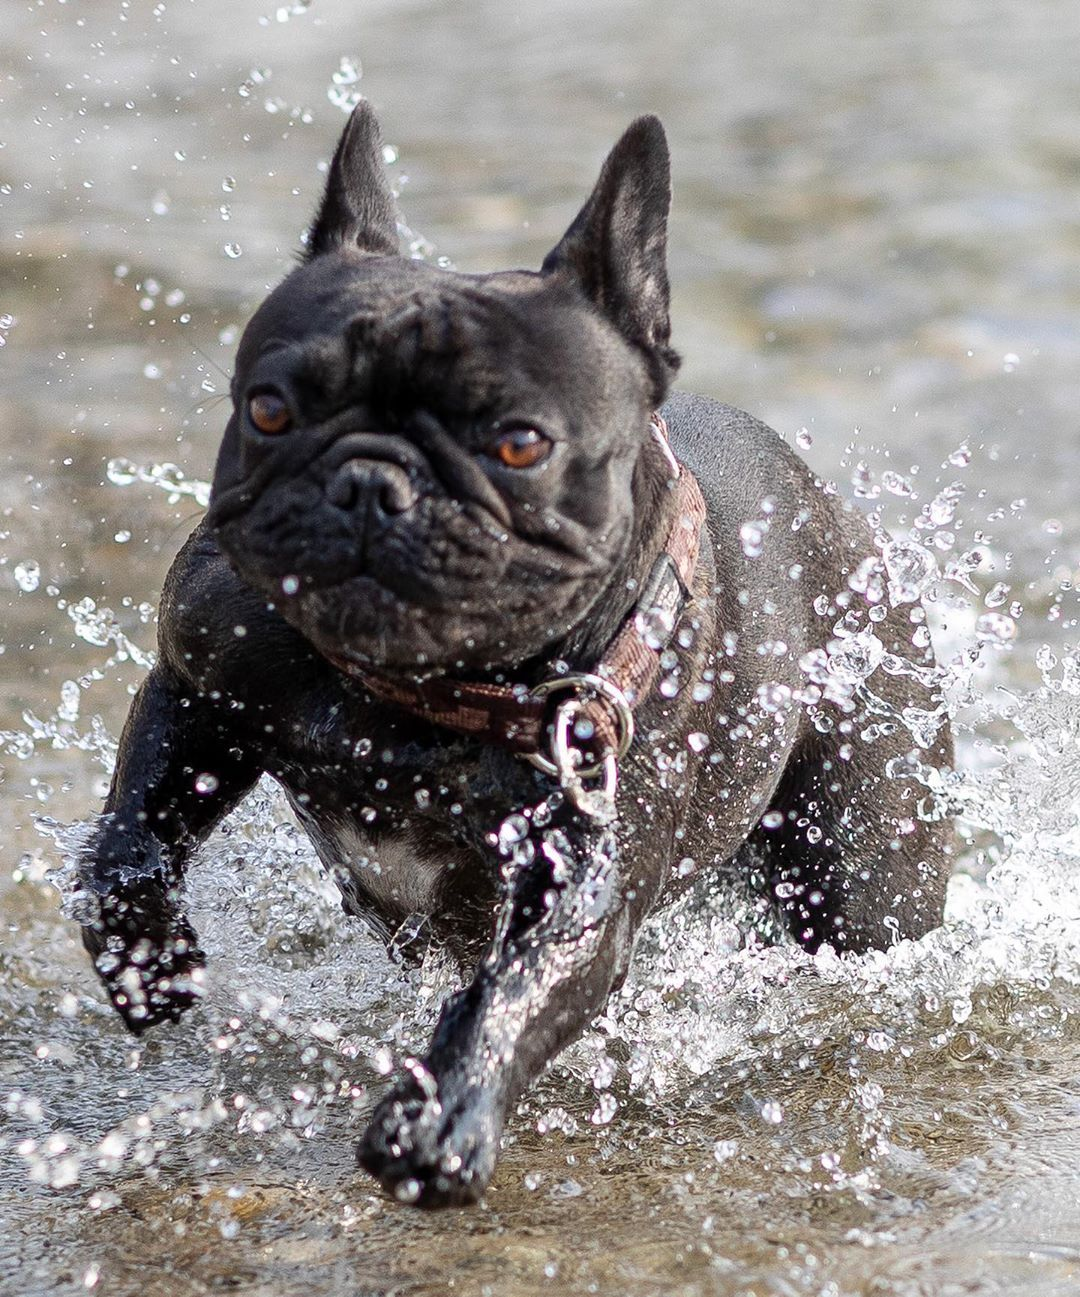 Danu Mercier Auf Instagram Ostermontag Spaziergang Mit Ilsebill Vom Hause Globi Ilsebillvomhauseglobi Frenchbulldog Danume In 2020 Bulldog French Bulldog Dogs